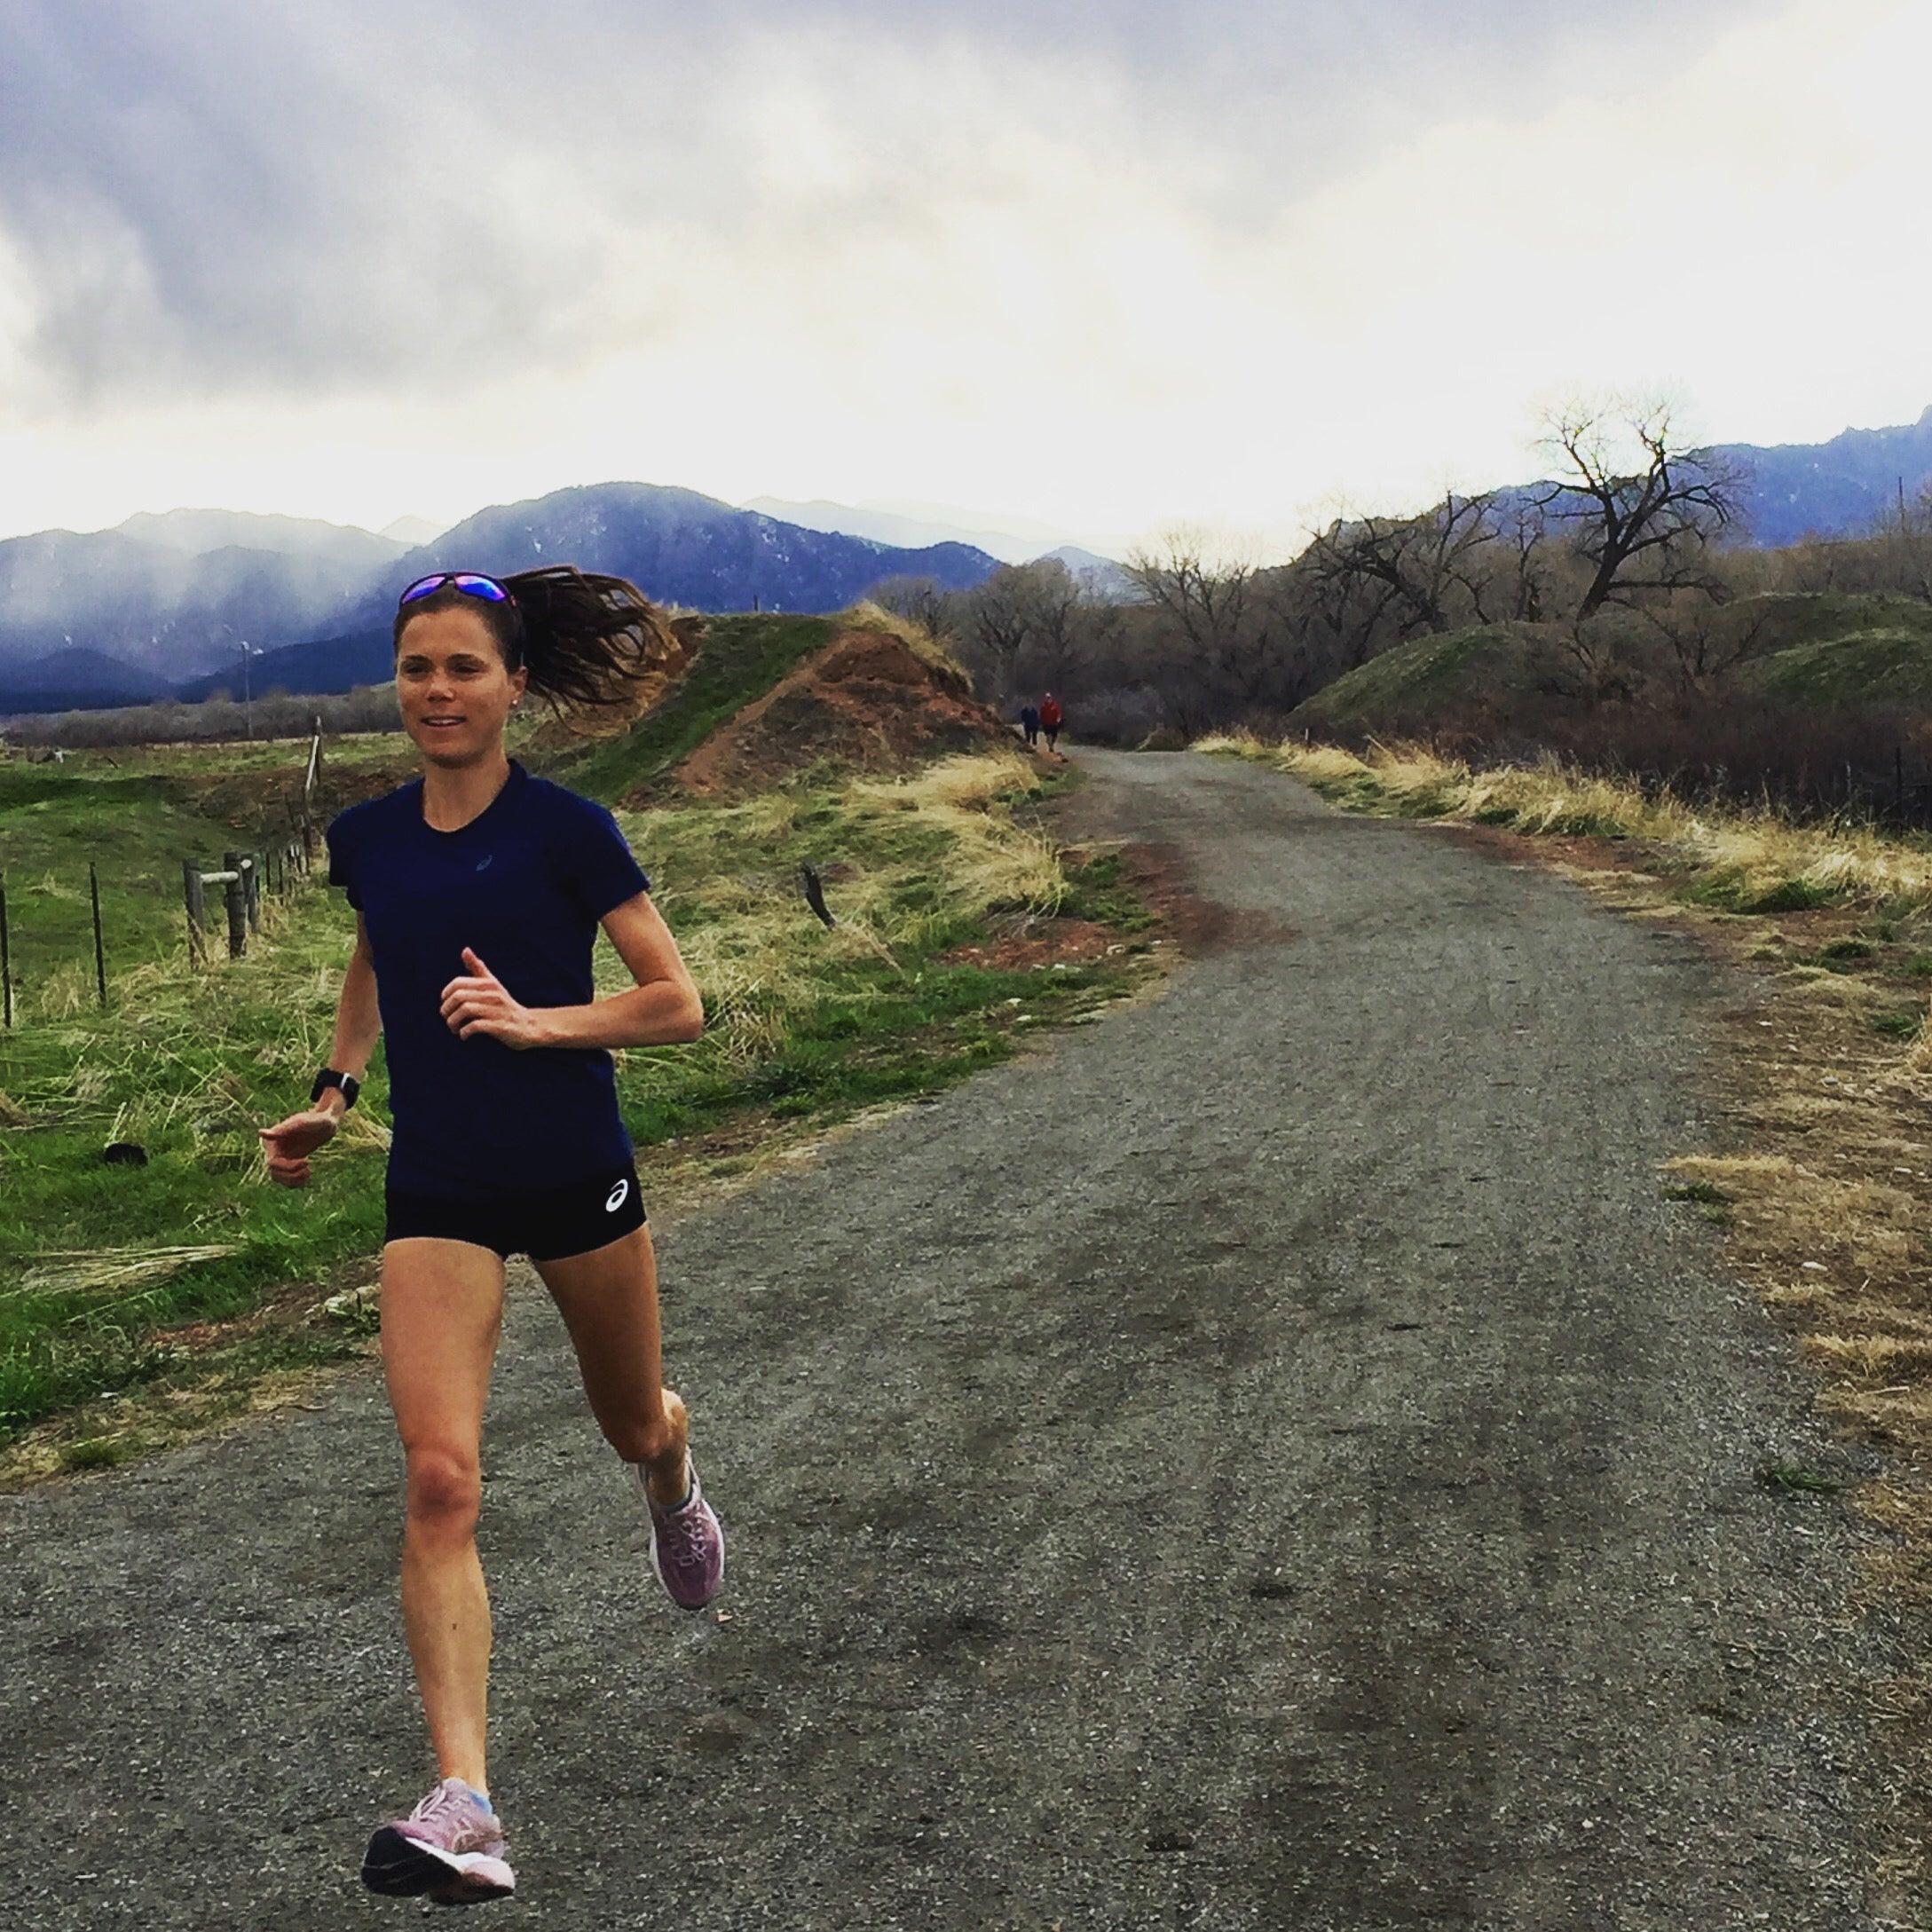 Lindsay Flanagan training